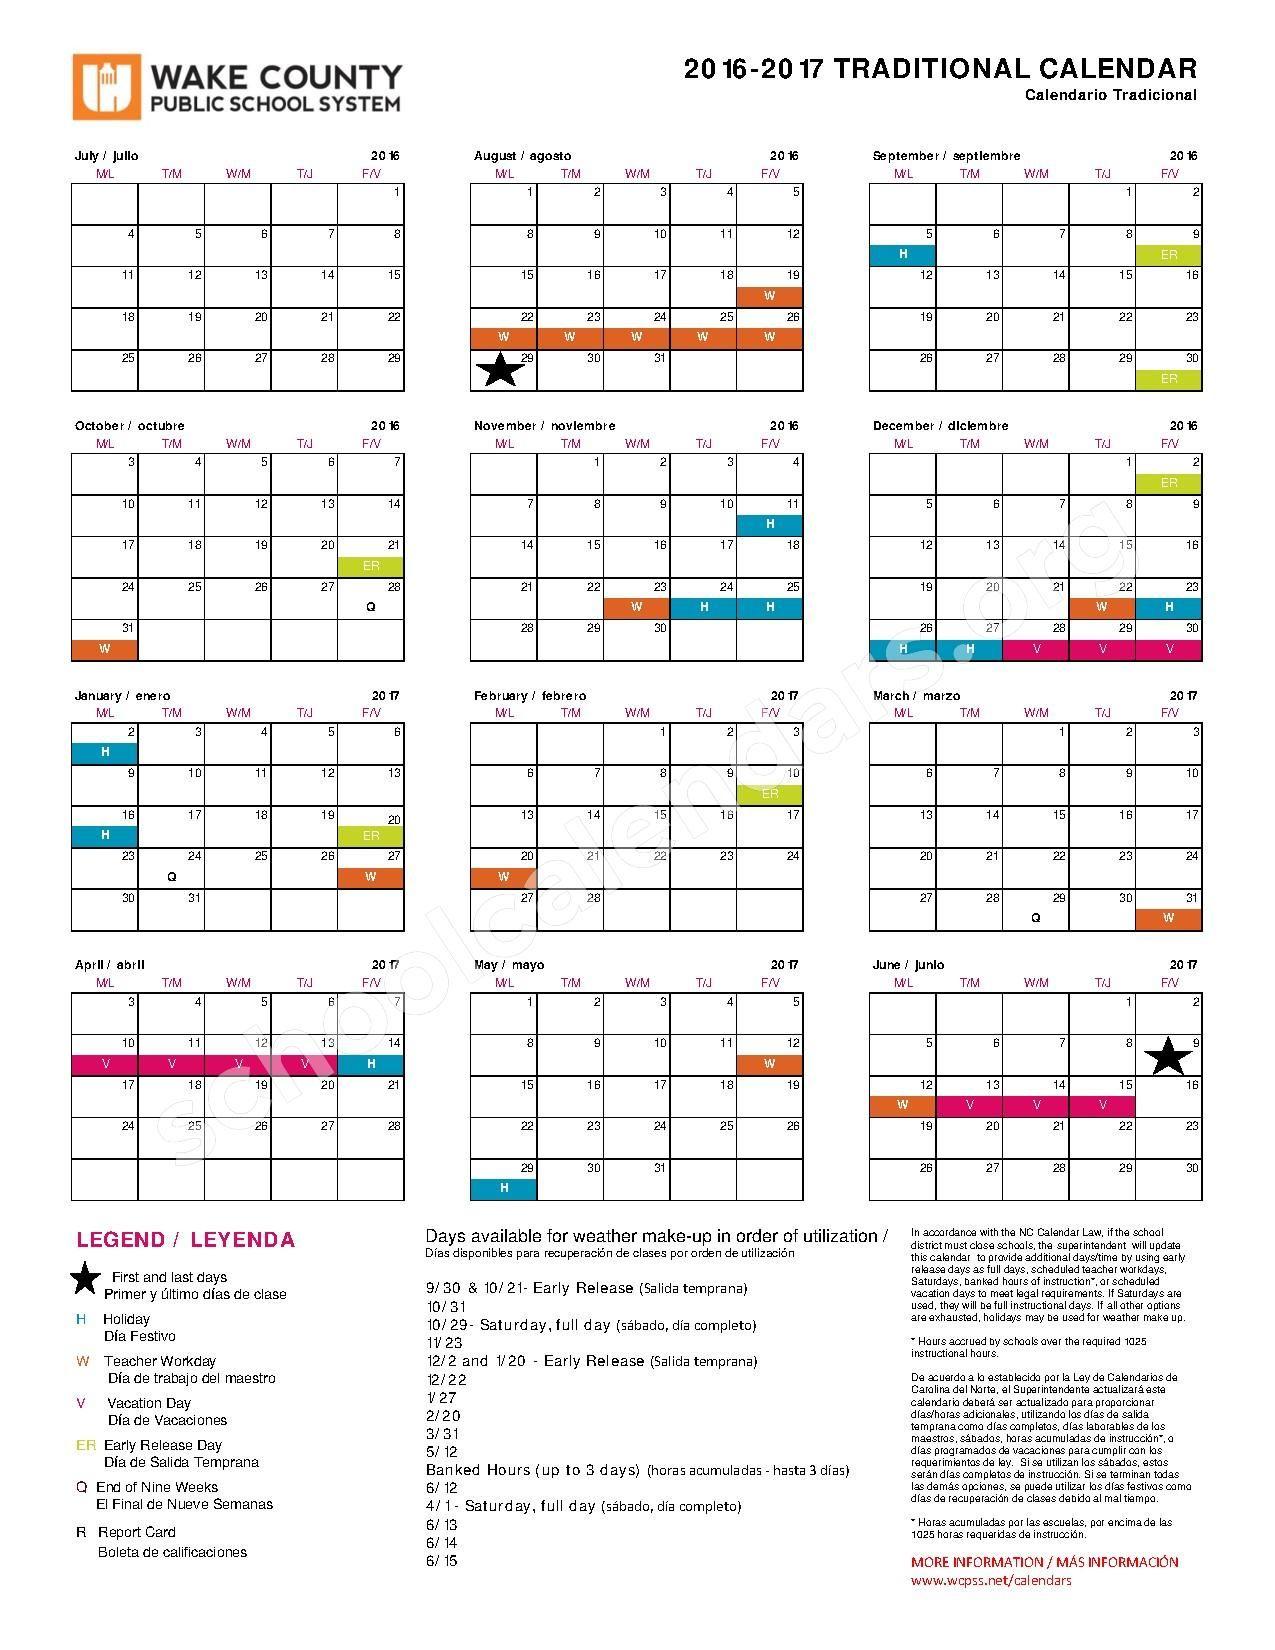 Wake County Public Schools Christmas Break 2020 Wake County Public School Calendar with Holidays https://